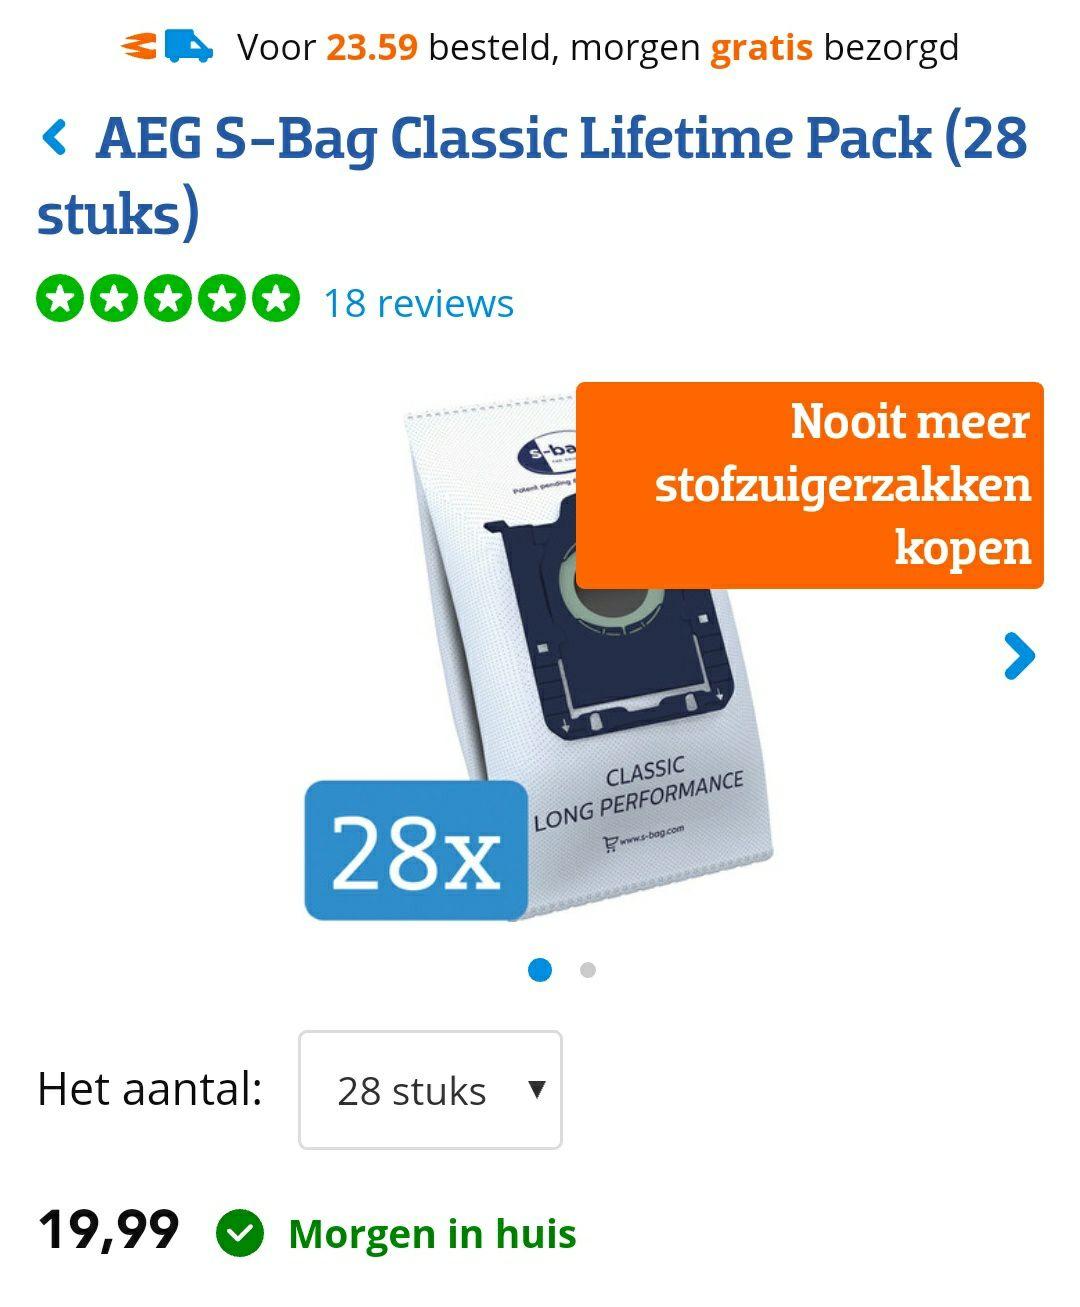 Orginele S bag stofzuigerzakken voor a.o Philips & AEG bij Coolblue